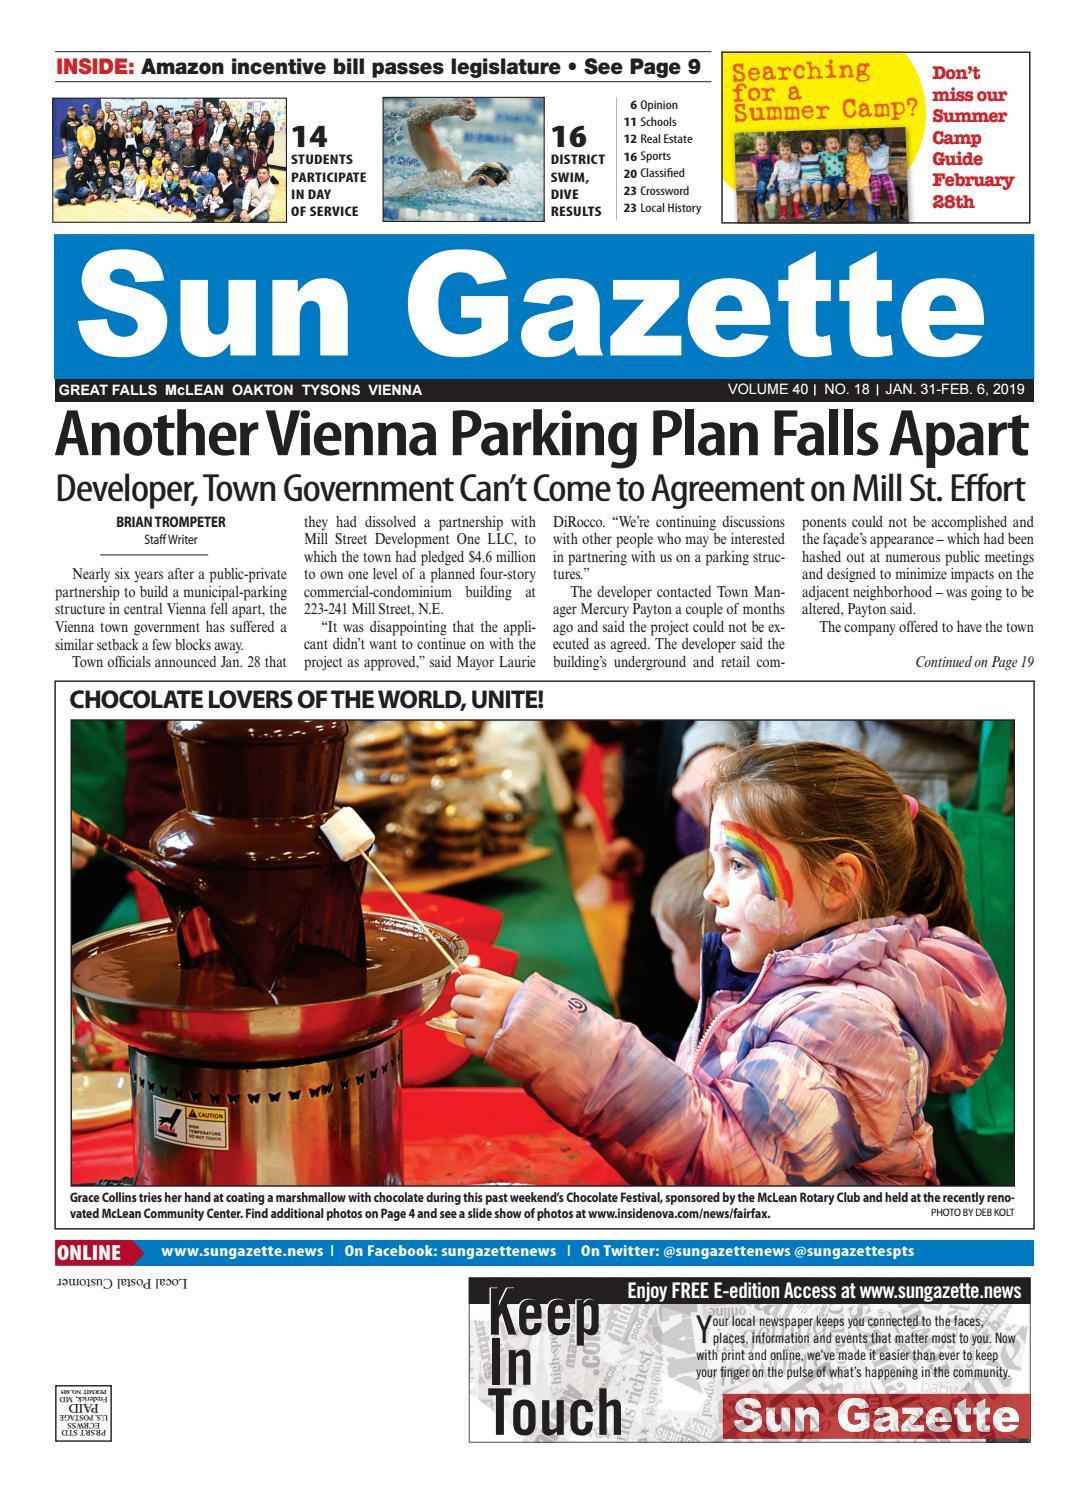 Great Falls, McLean, Oakton, Vienna Sun Gazette by